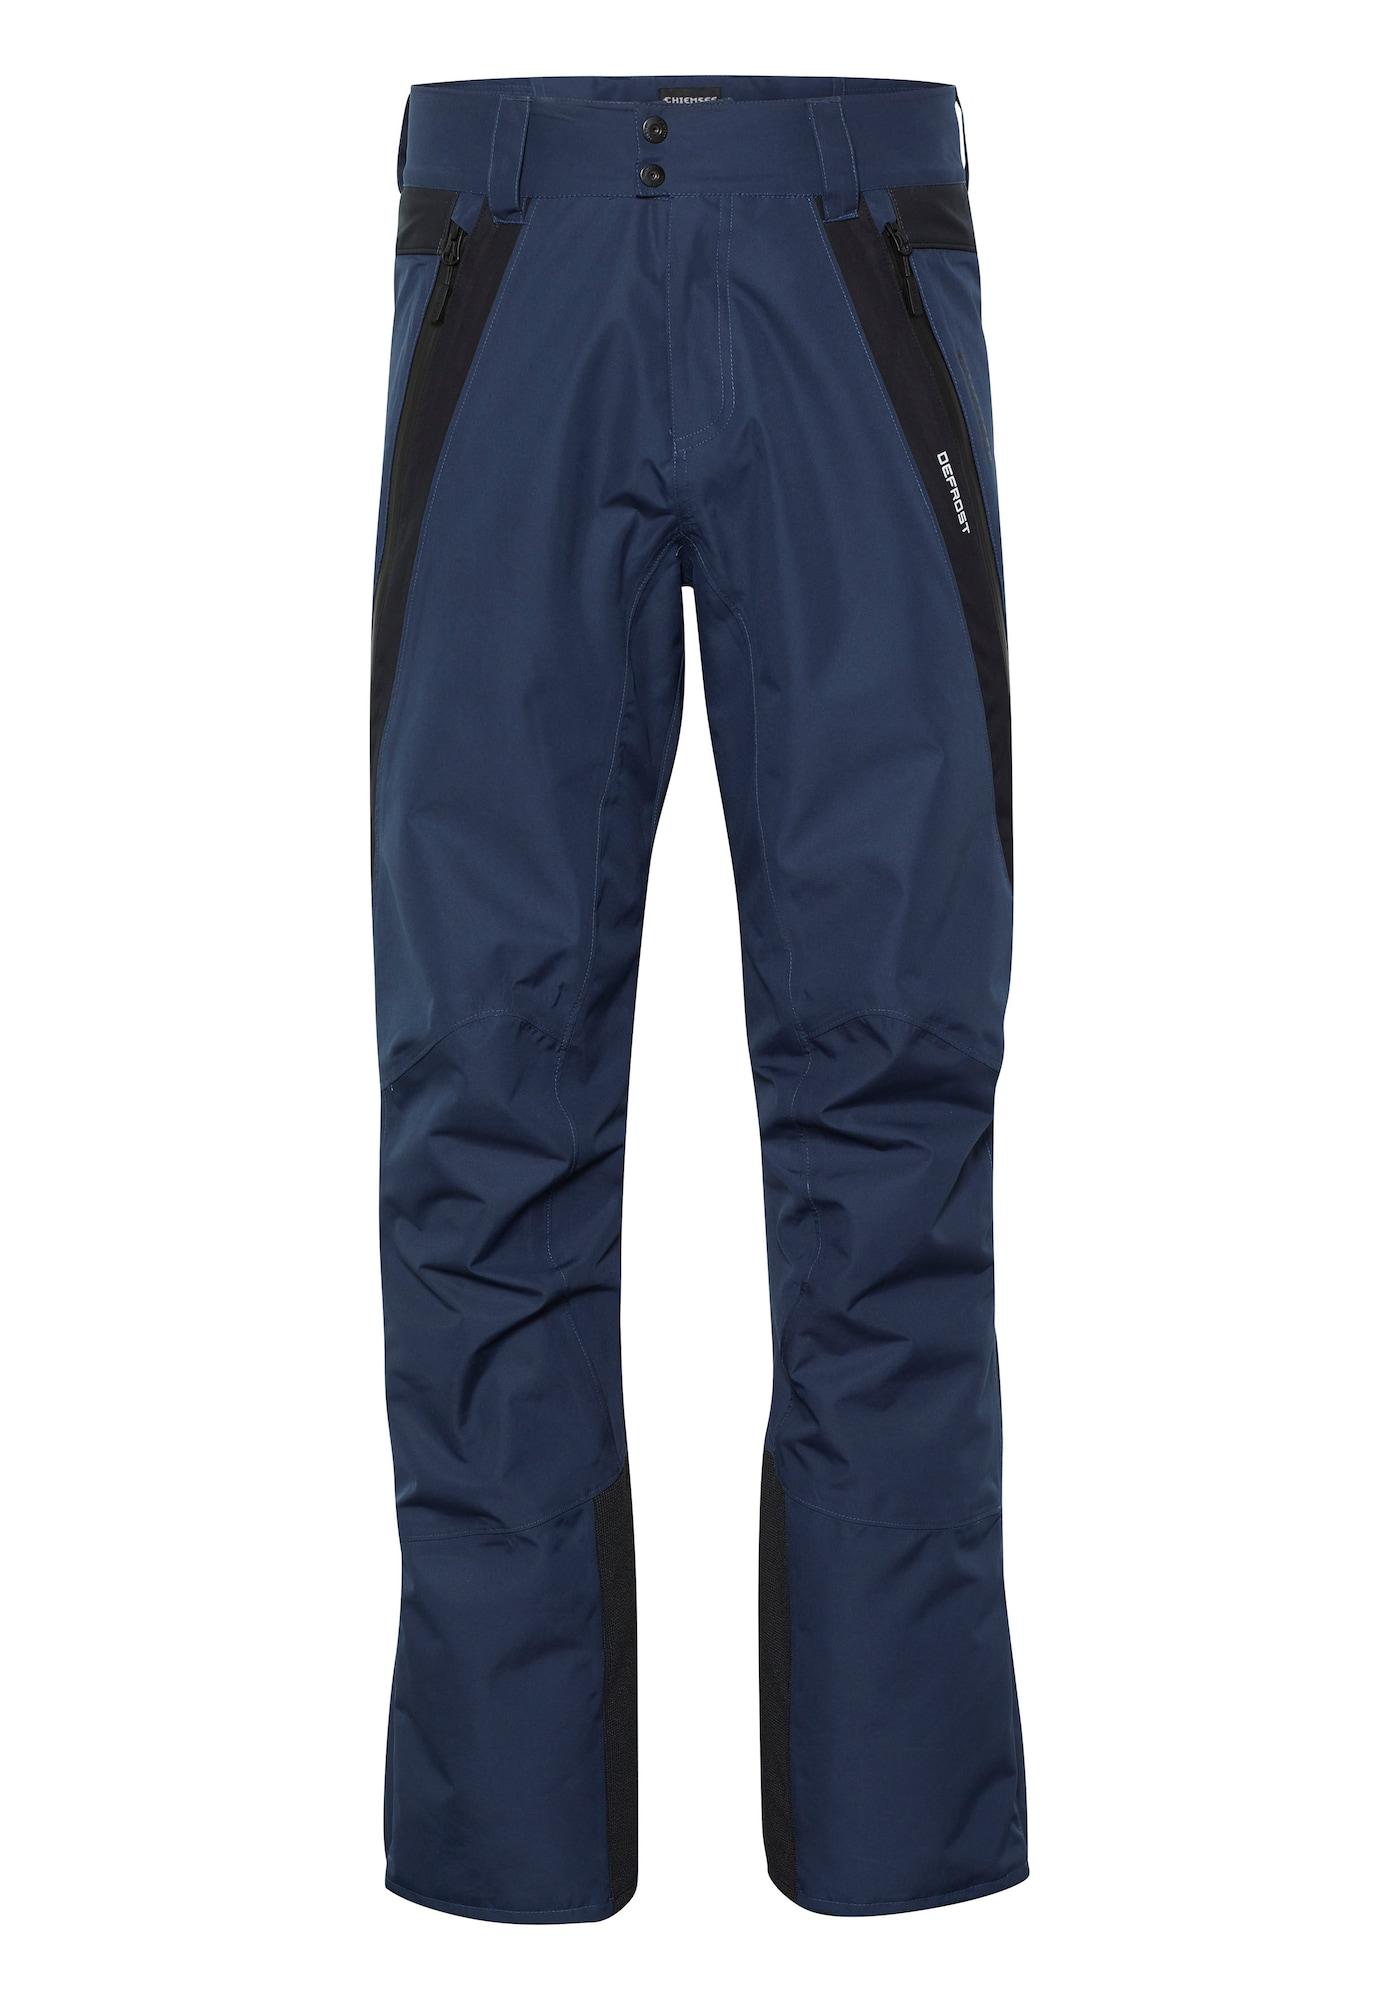 CHIEMSEE Outdoorové kalhoty 'SNOWMASS'  tmavě modrá